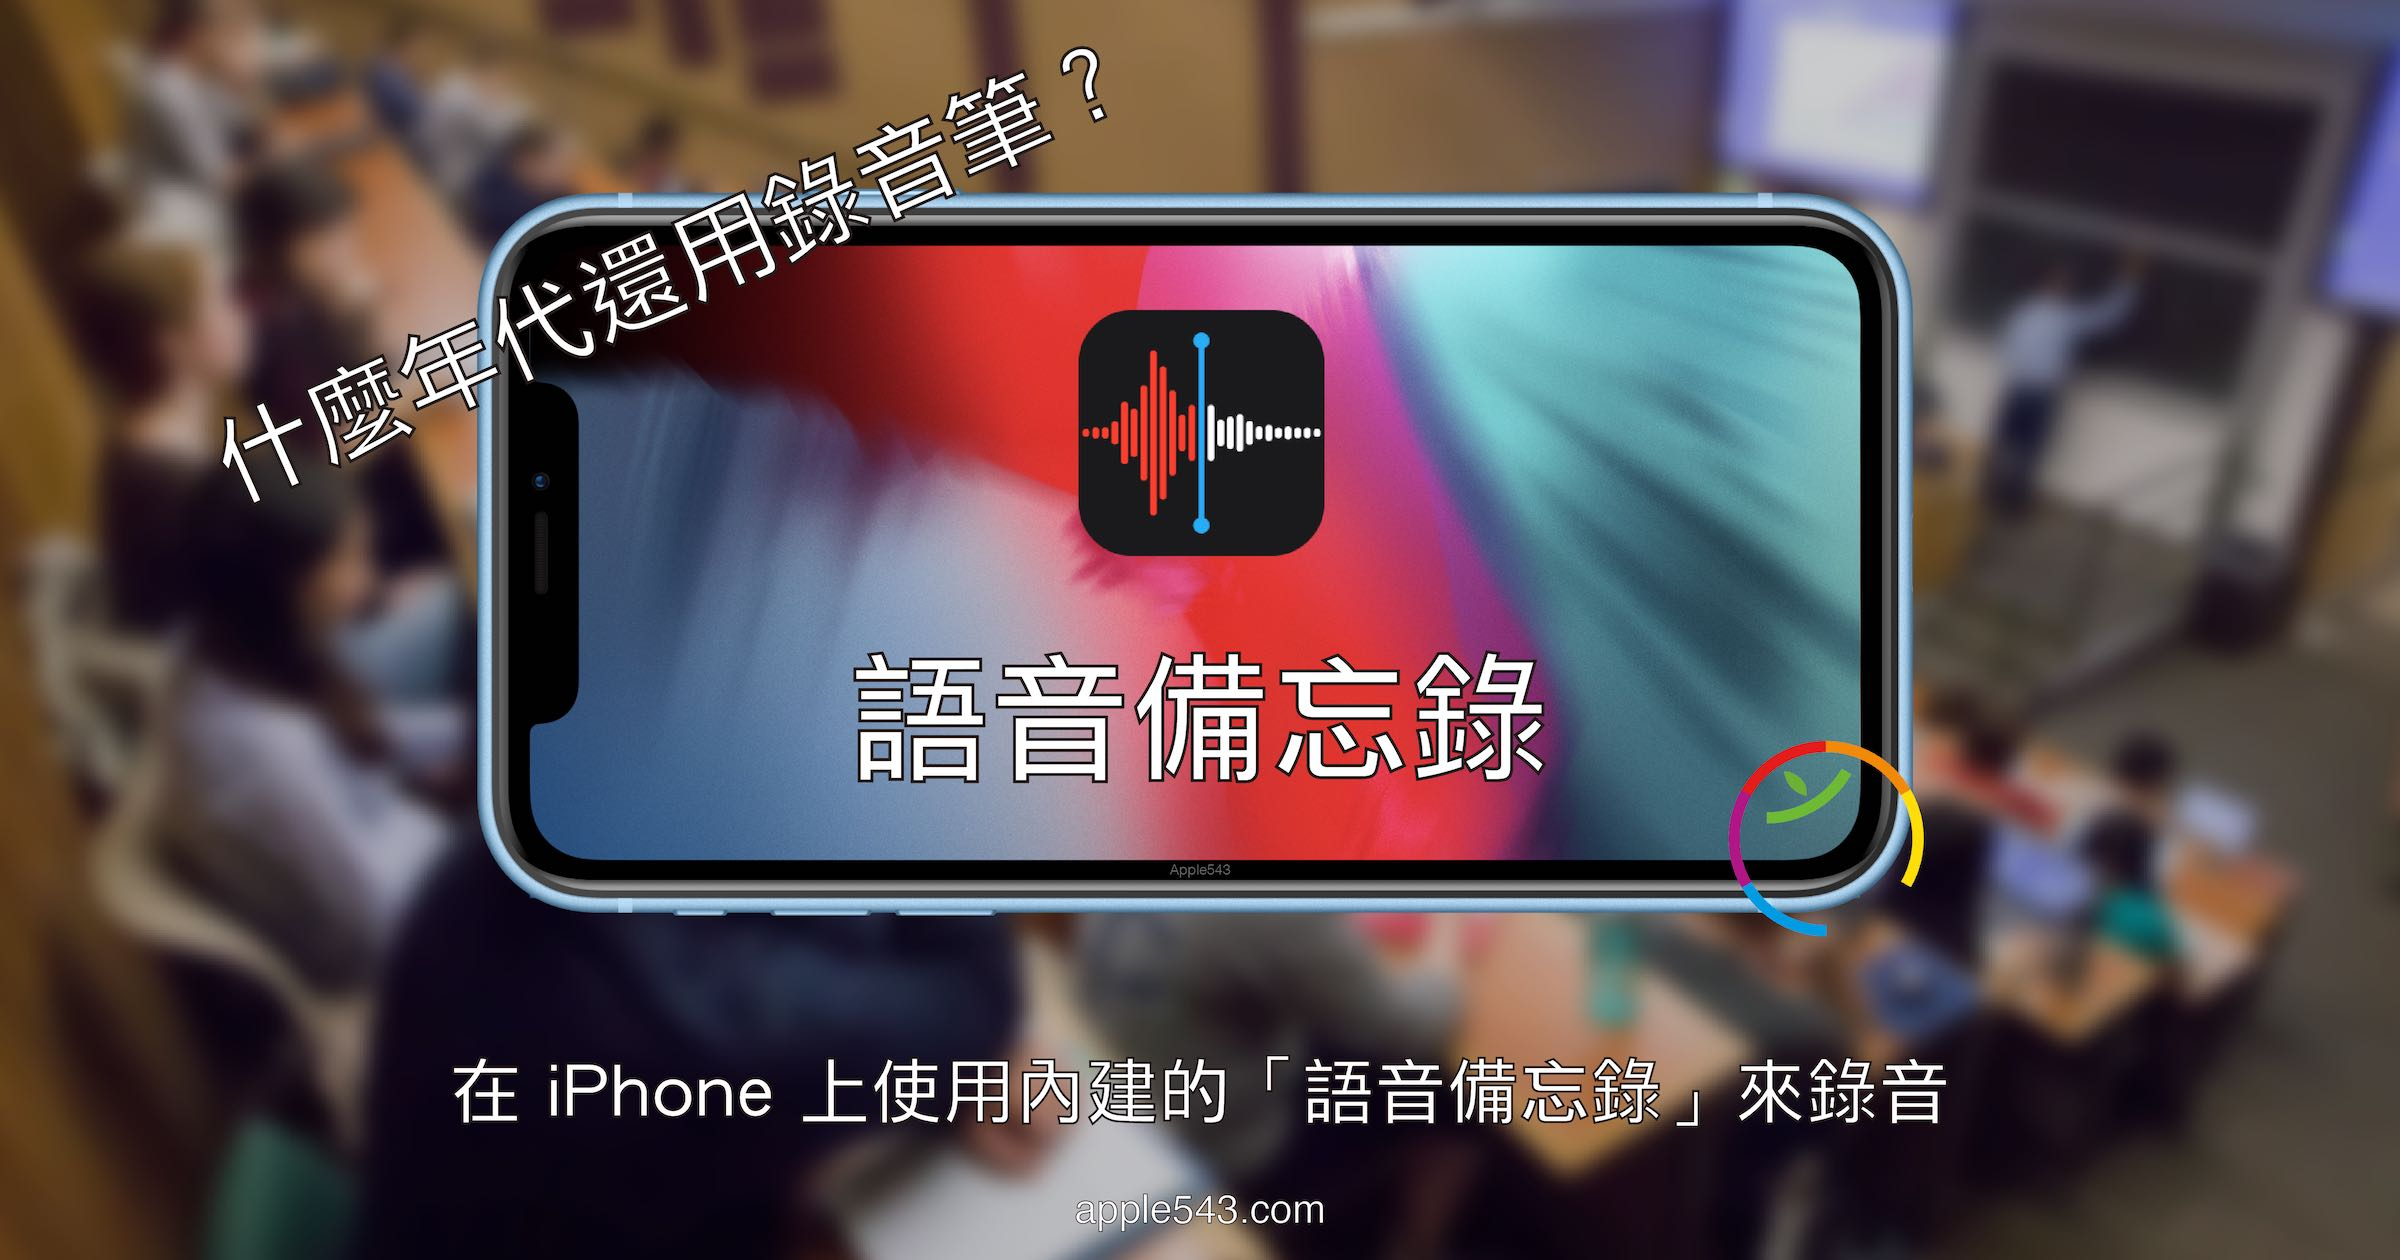 iPhone 錄音